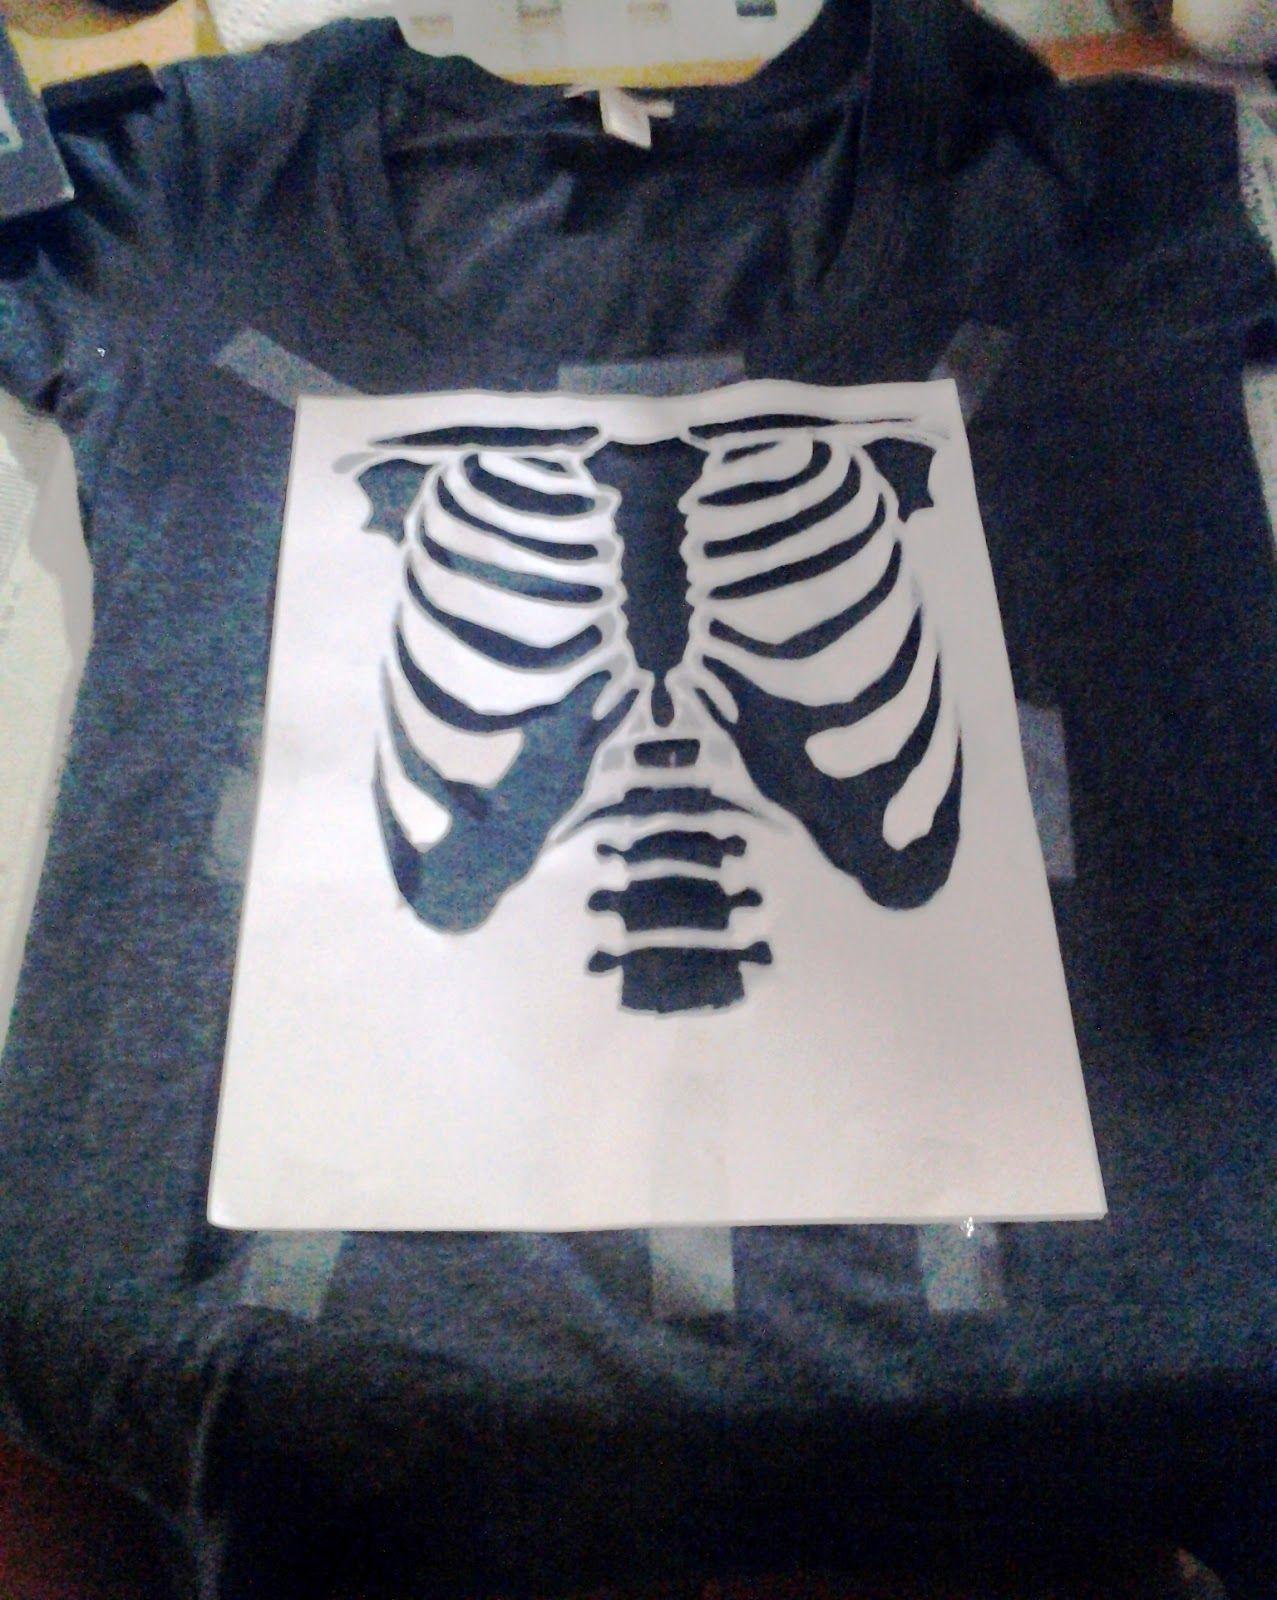 Spray Paint T Shirt Craft Using A Stencil To Create A Design